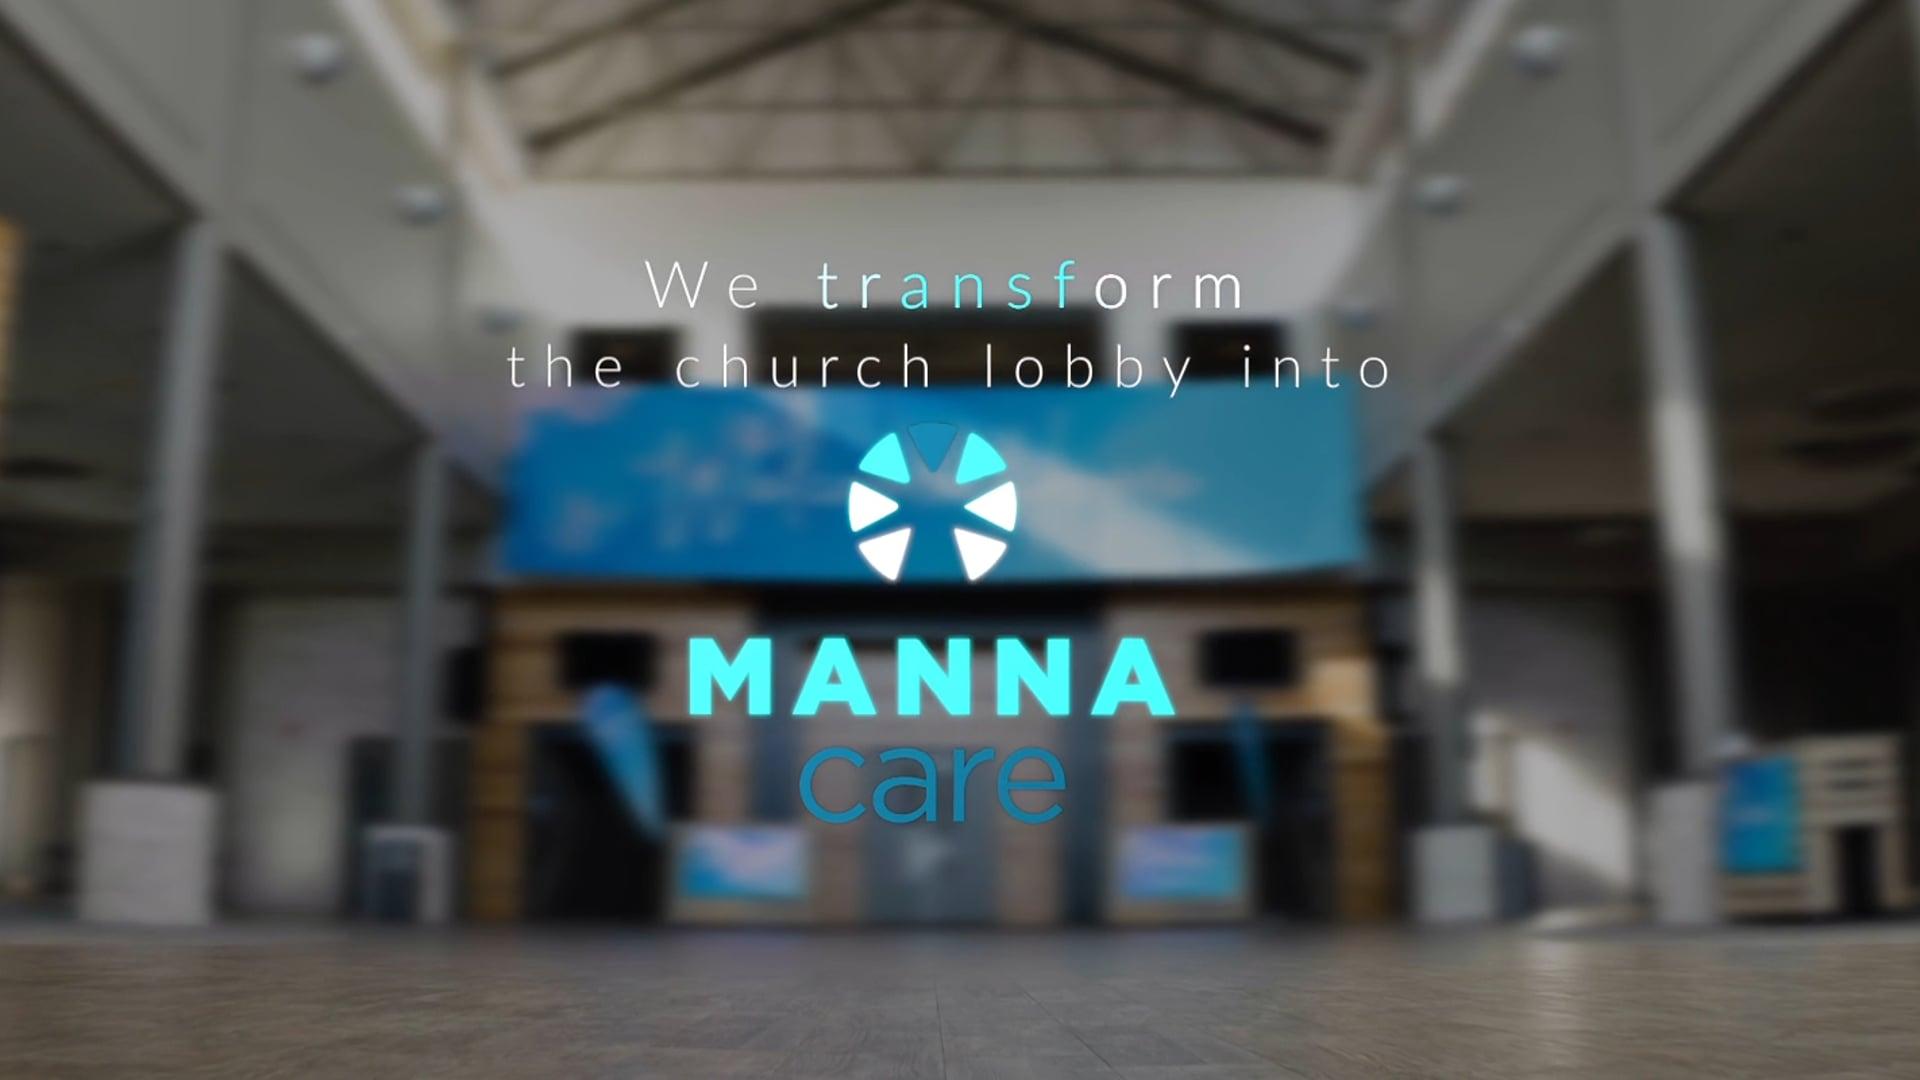 Food Bank Timelapse - Manna Care